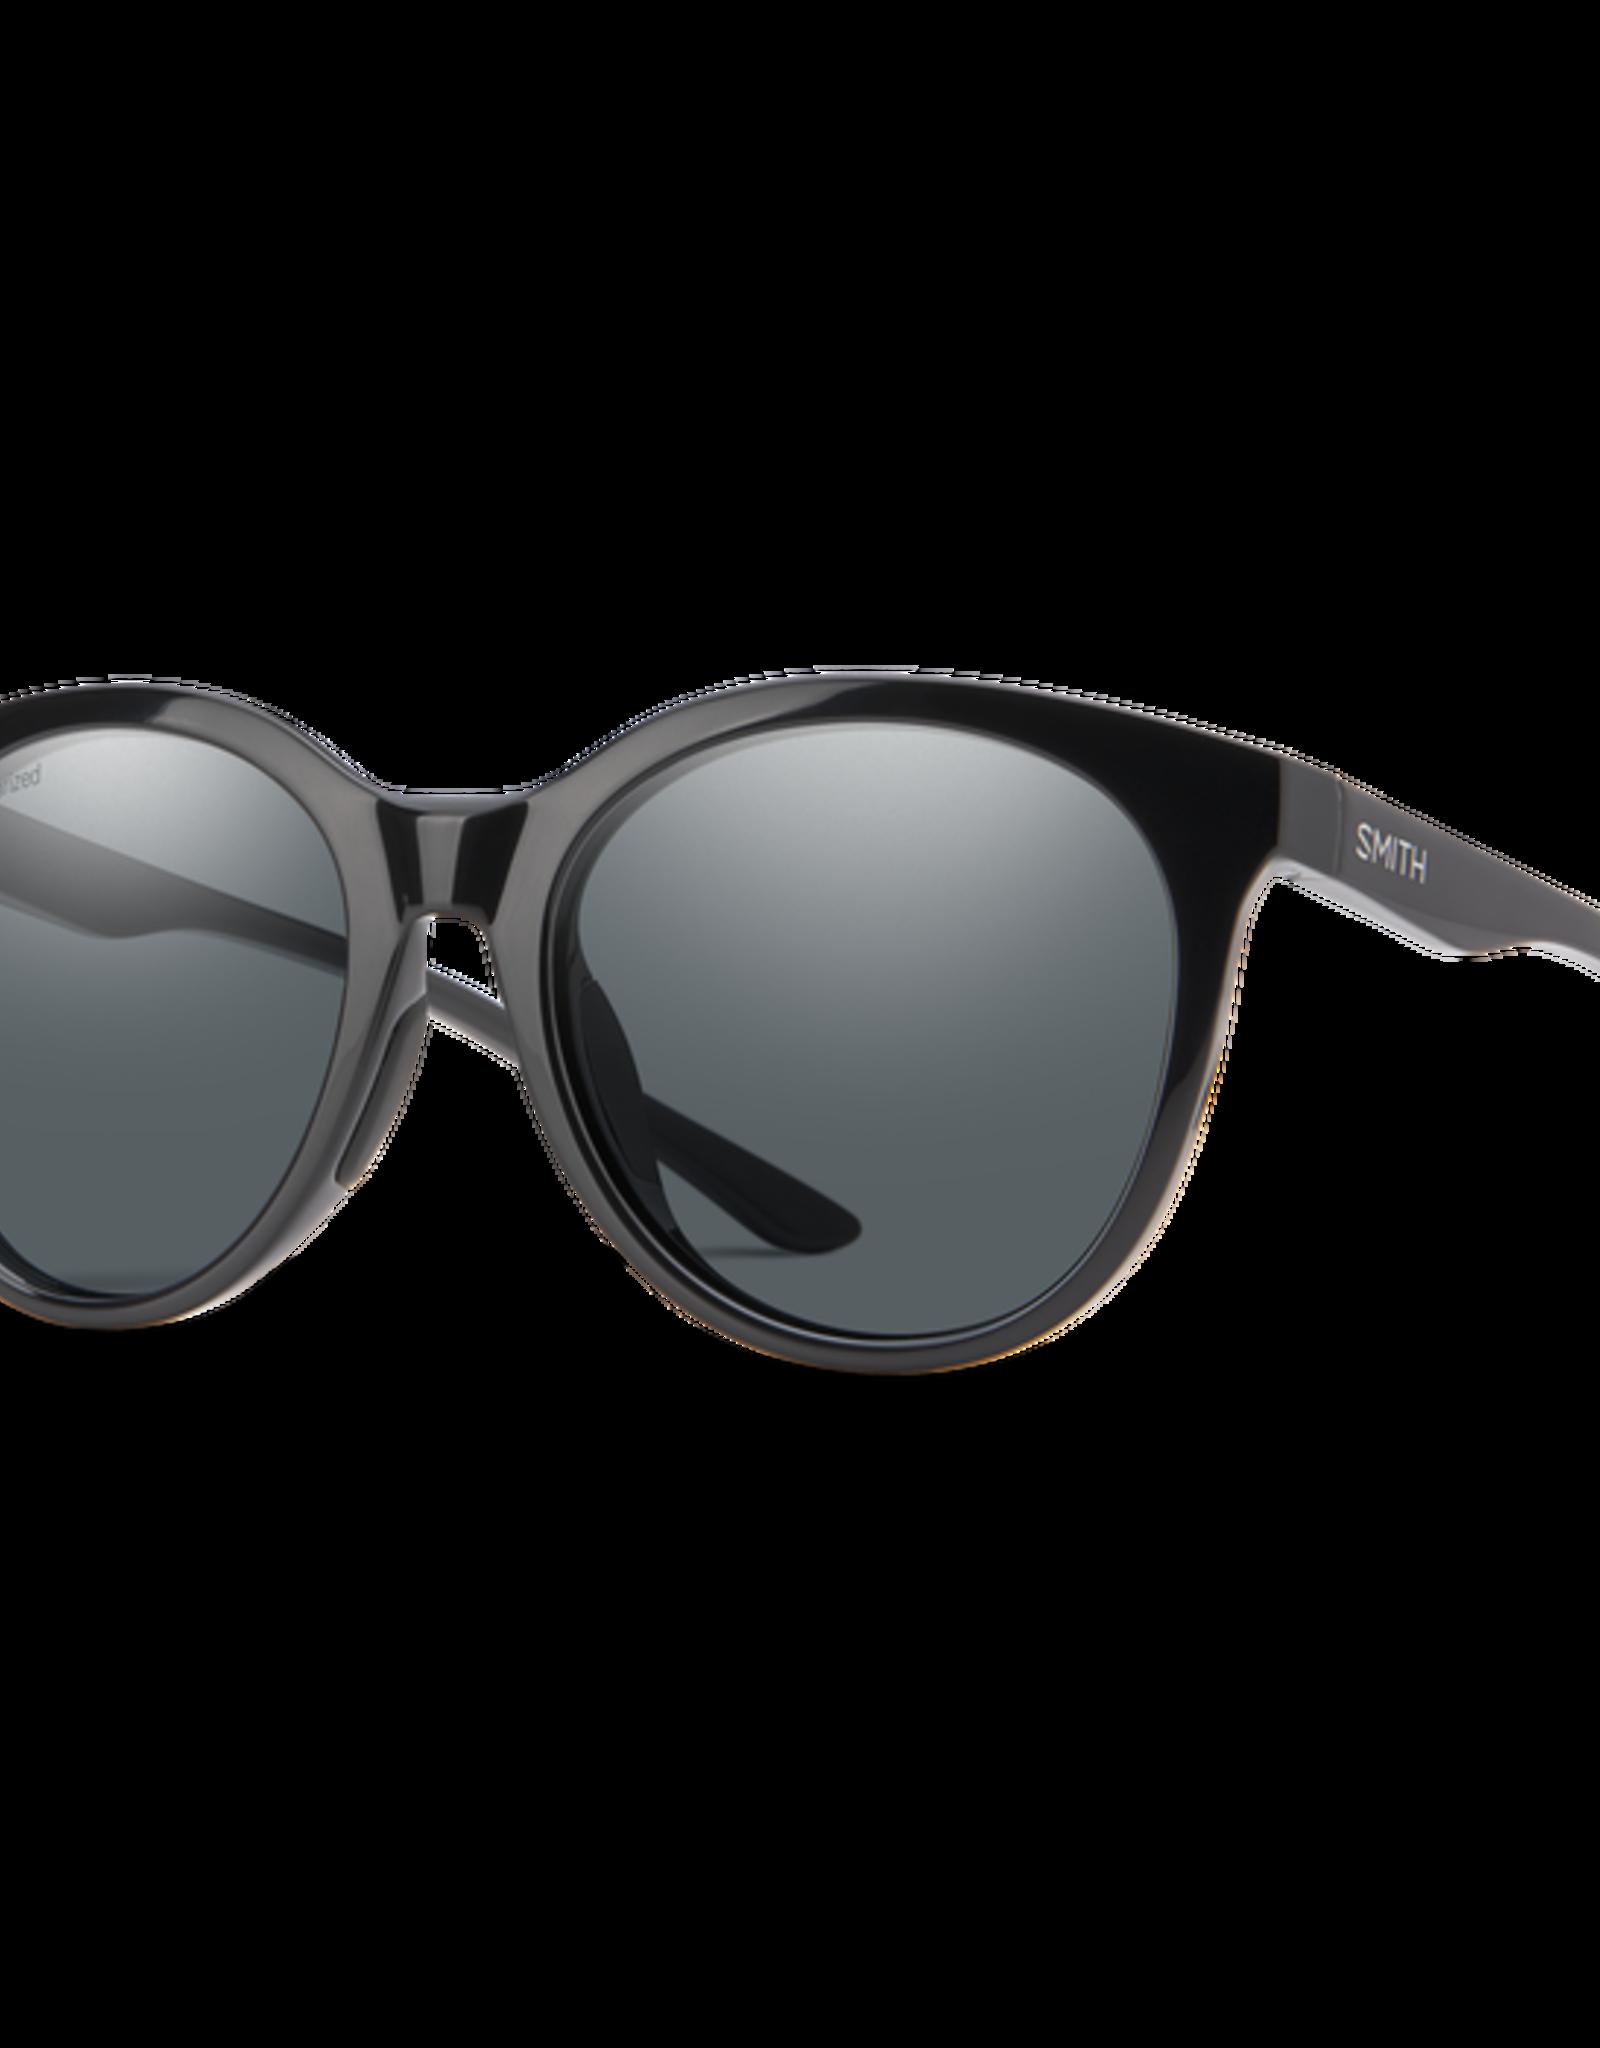 Smith Optics Smith - BAYSIDE - Black w/ POLAR Gray